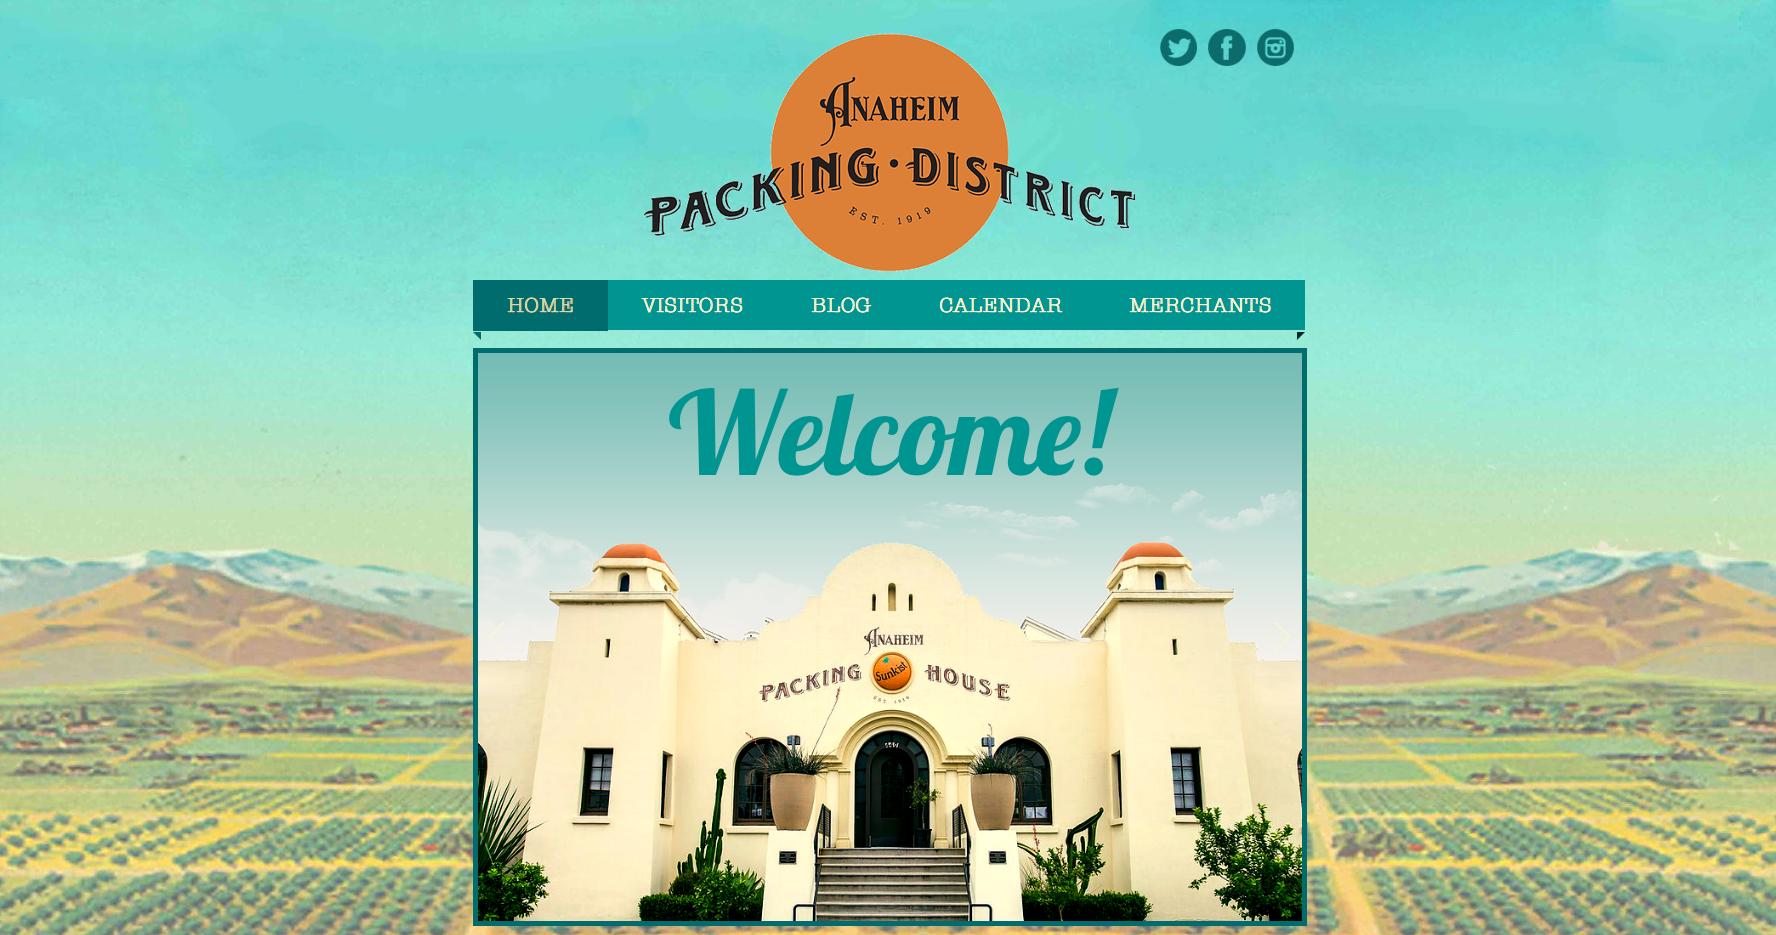 Food Hall | Orange County | Anaheim Packing District